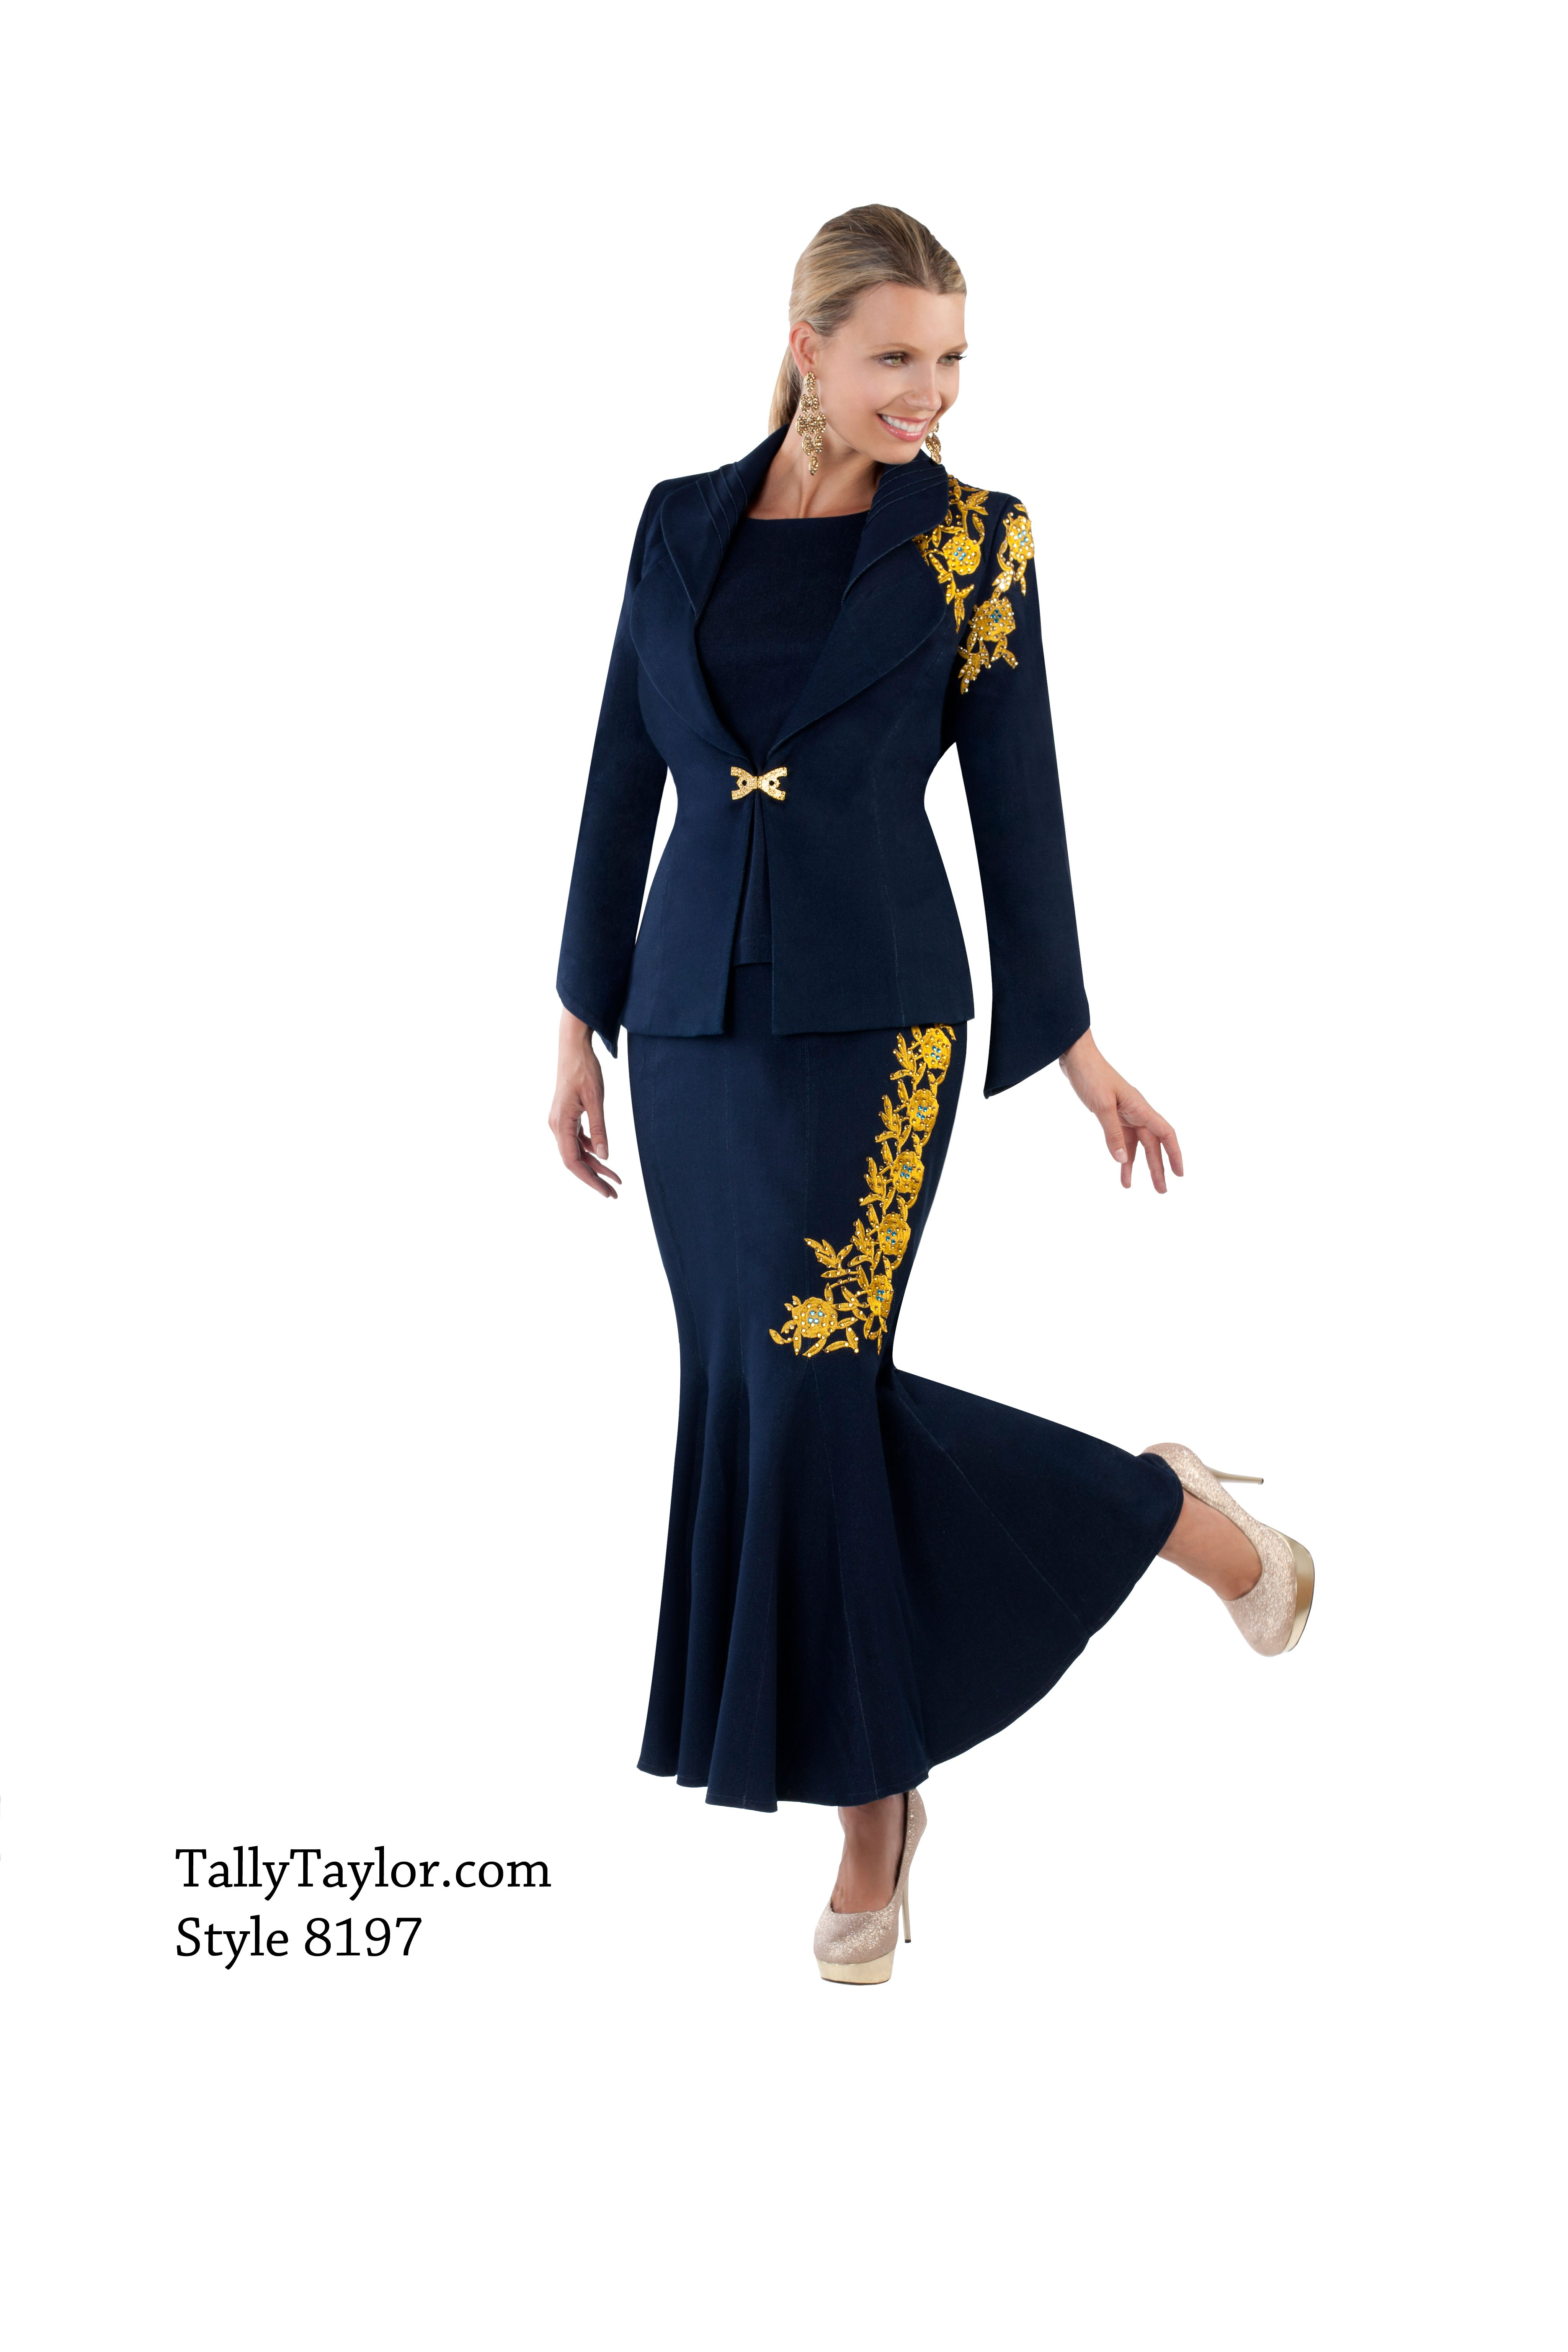 Womens Denim Suits by Odeliah - www.ExpressURWay.com - Womens ...